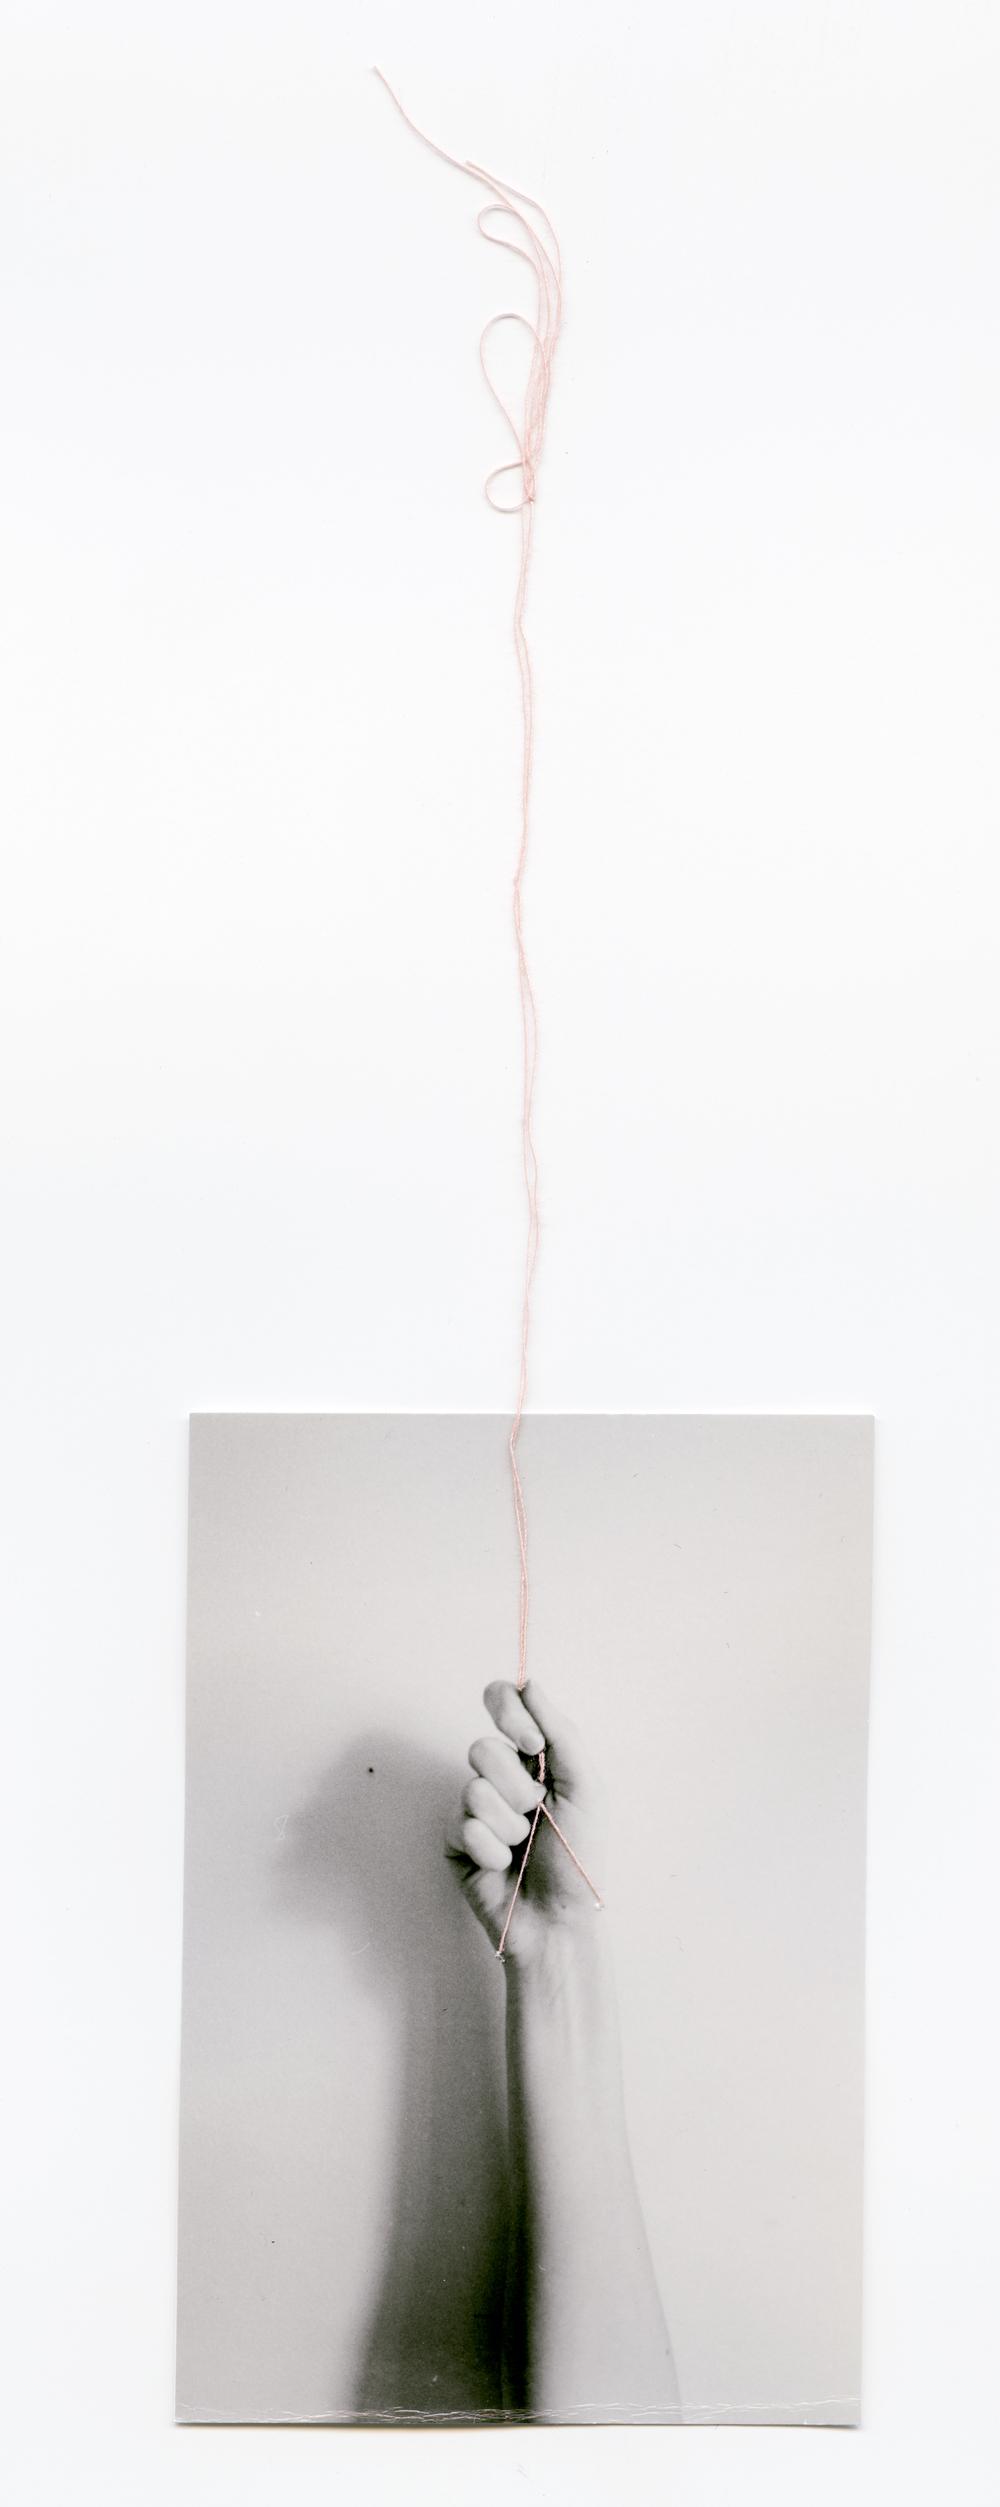 Grasp    Silver Gelatin Print, Thread, 2014